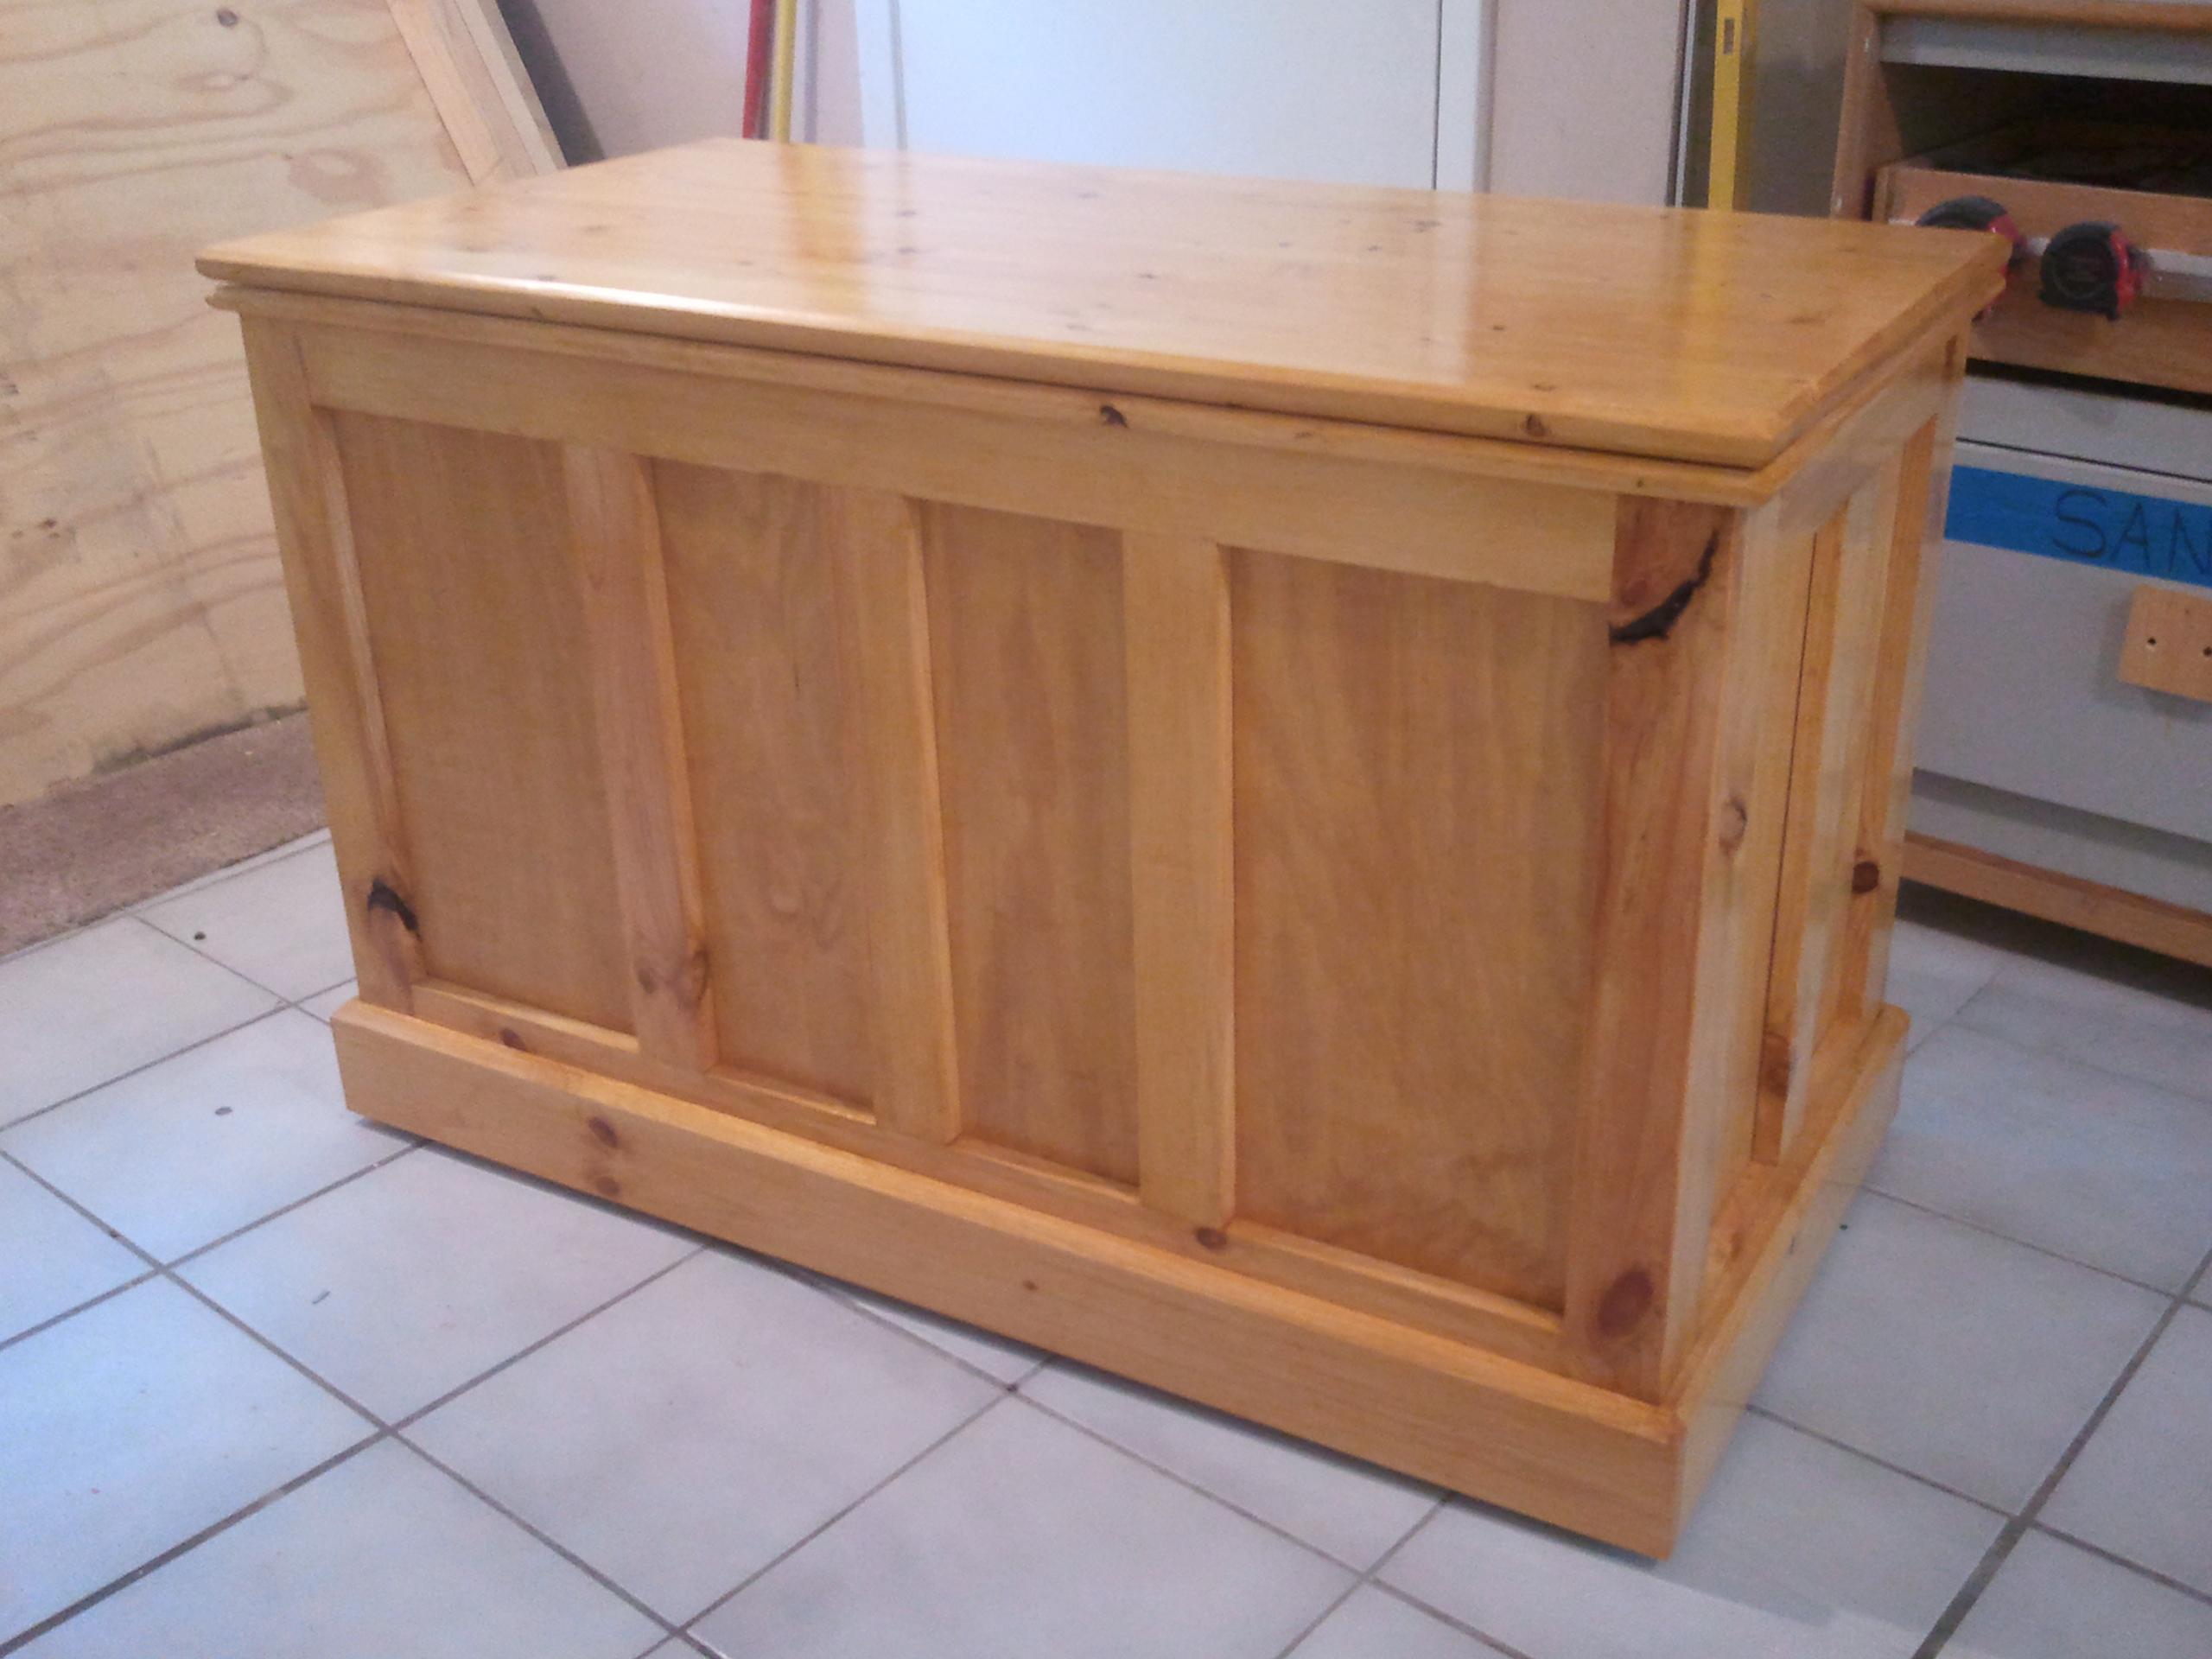 Blanket chest 3 nichole jays custom creations for Blanket chest designs